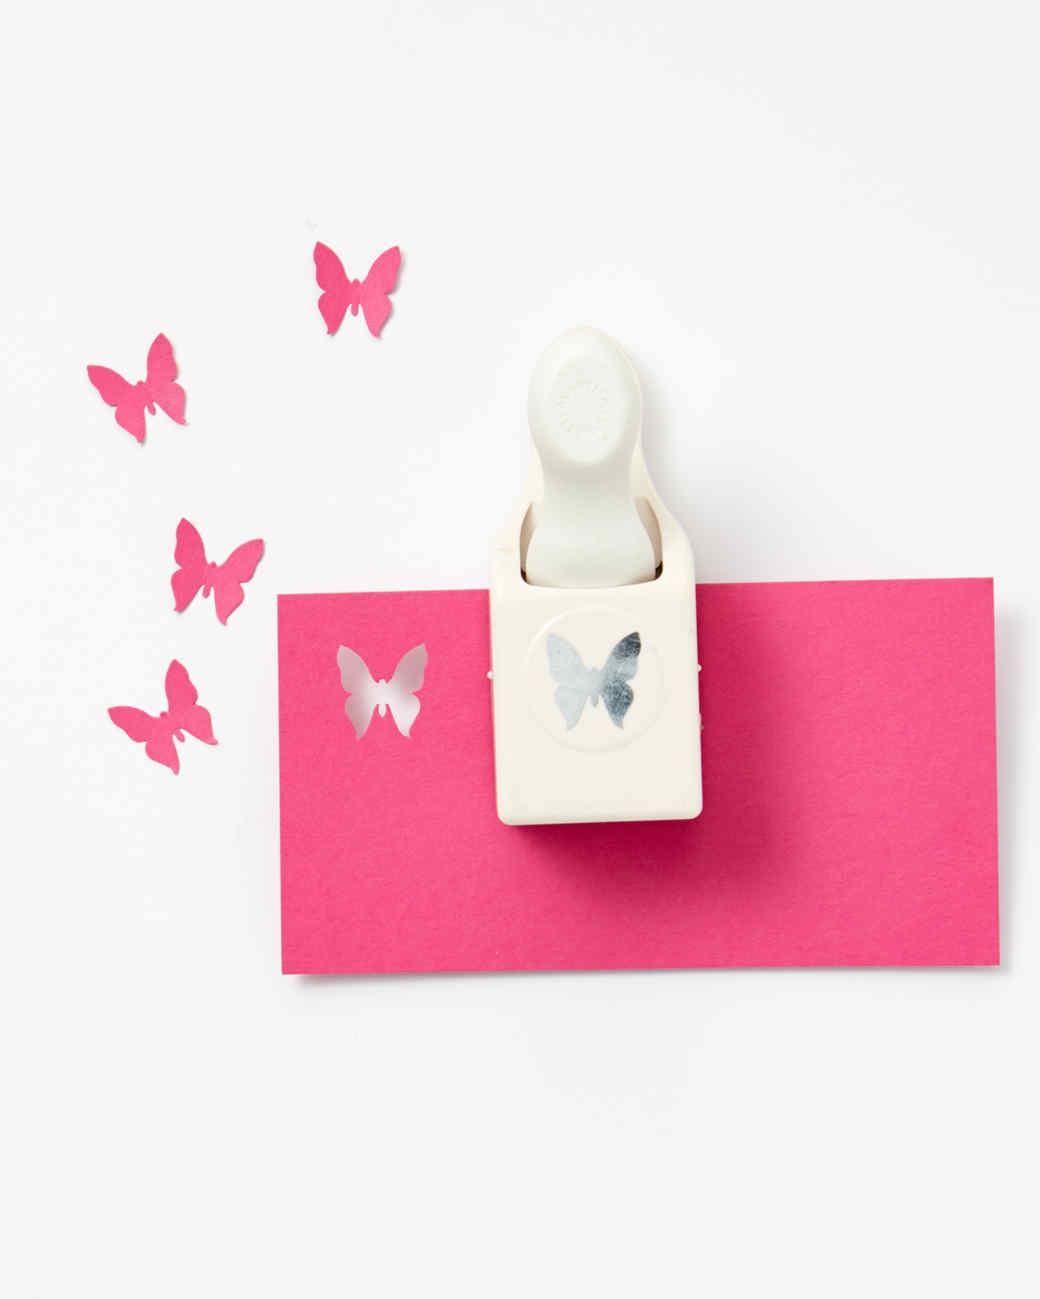 crafty-girl-basket-punch-3667-d112789-0116.jpg